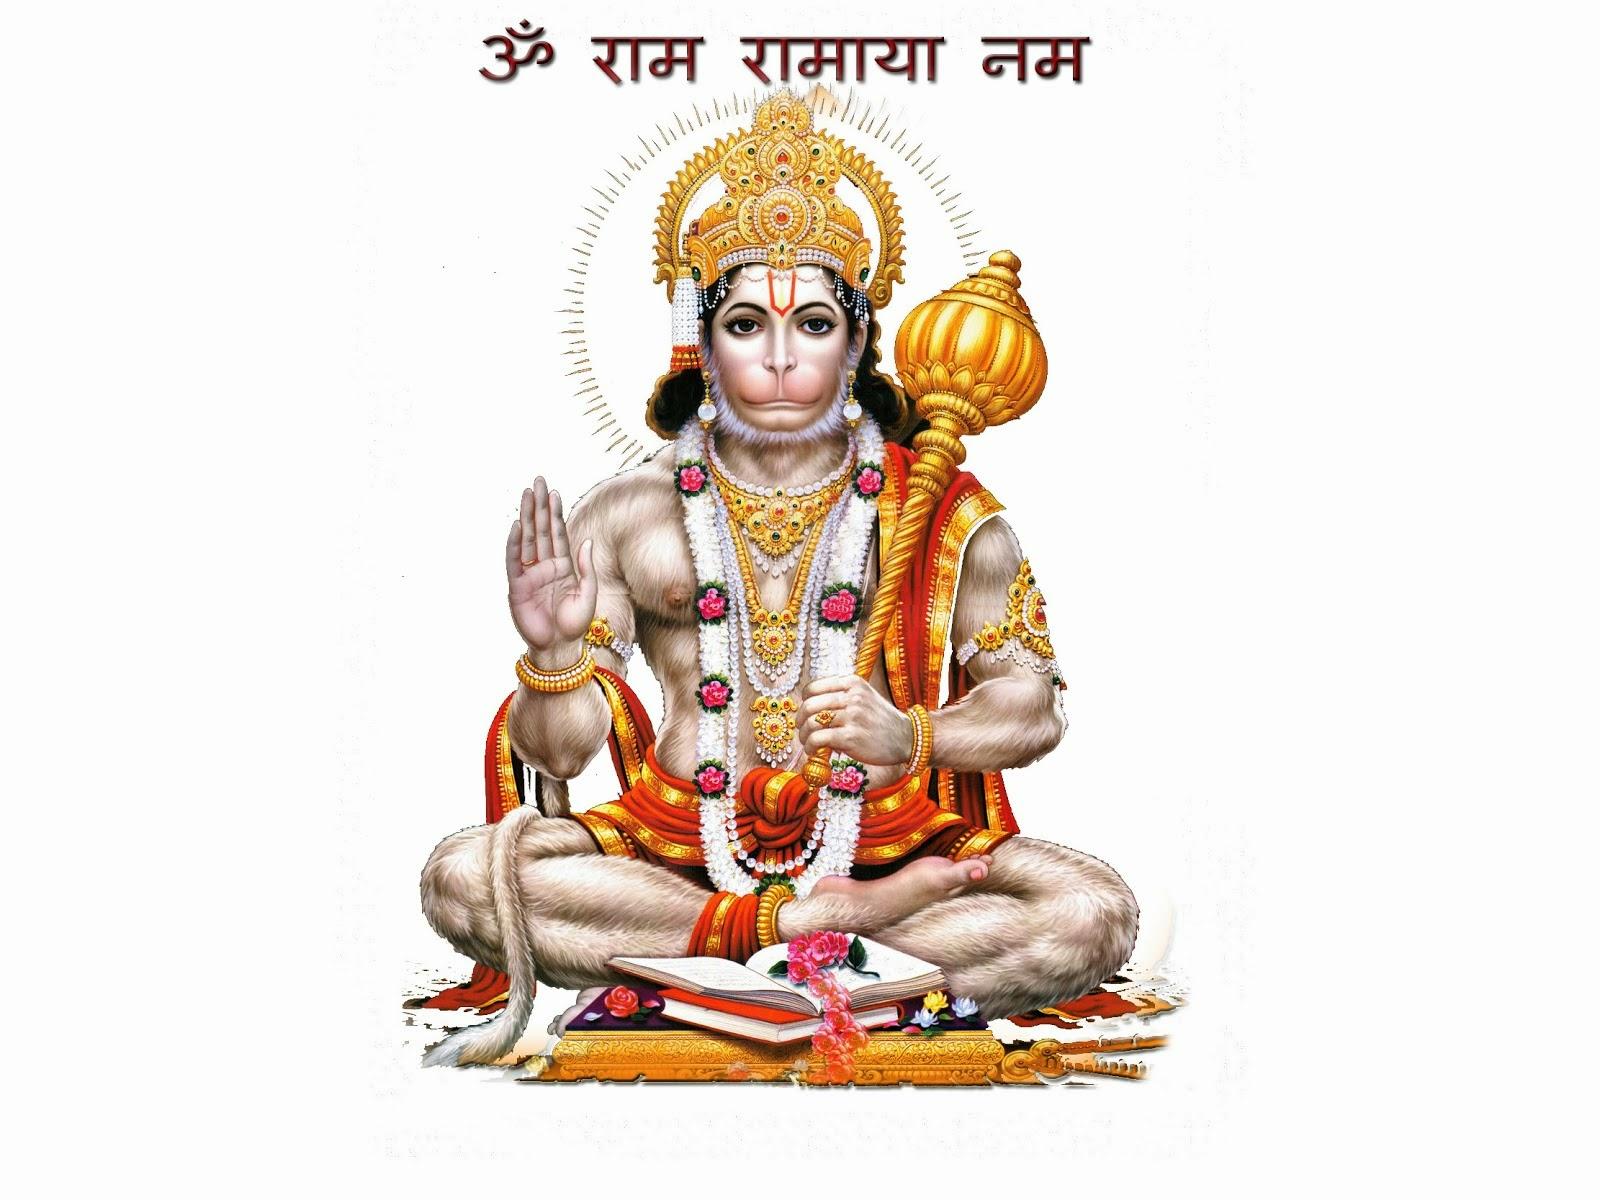 shri krishna hd wallpaper for pc